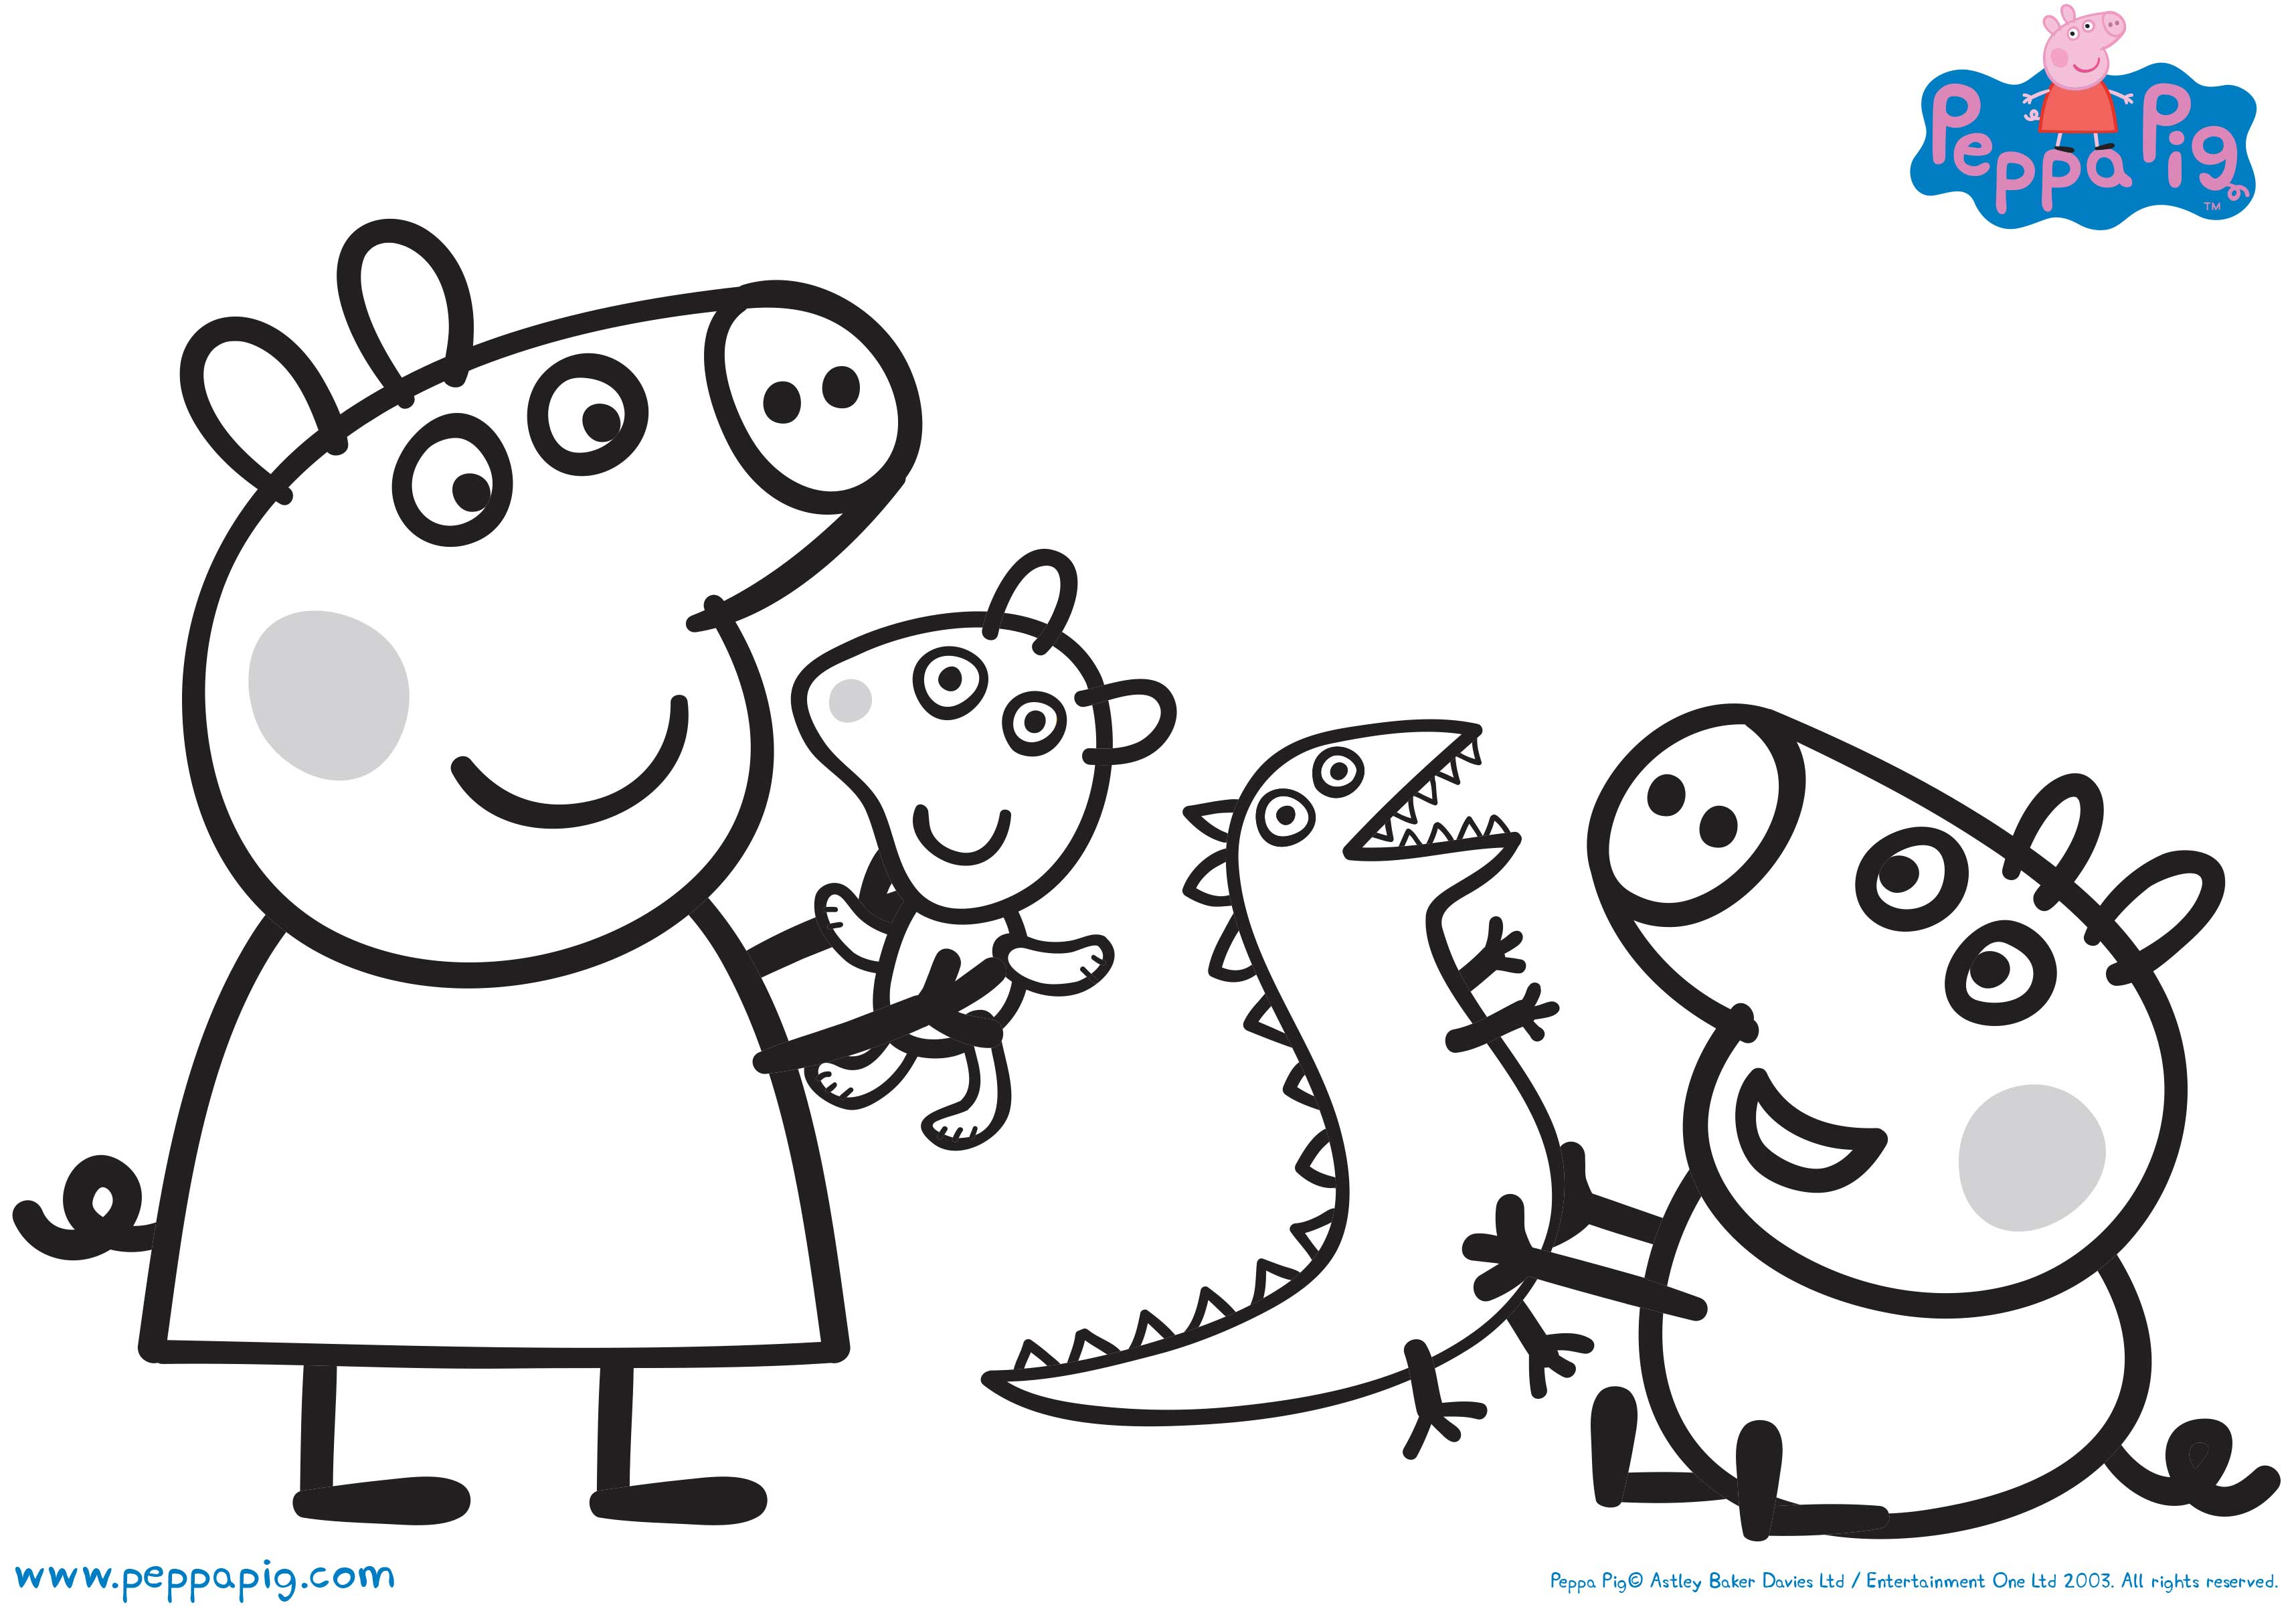 Peppa Pig Drawing at GetDrawings Free download